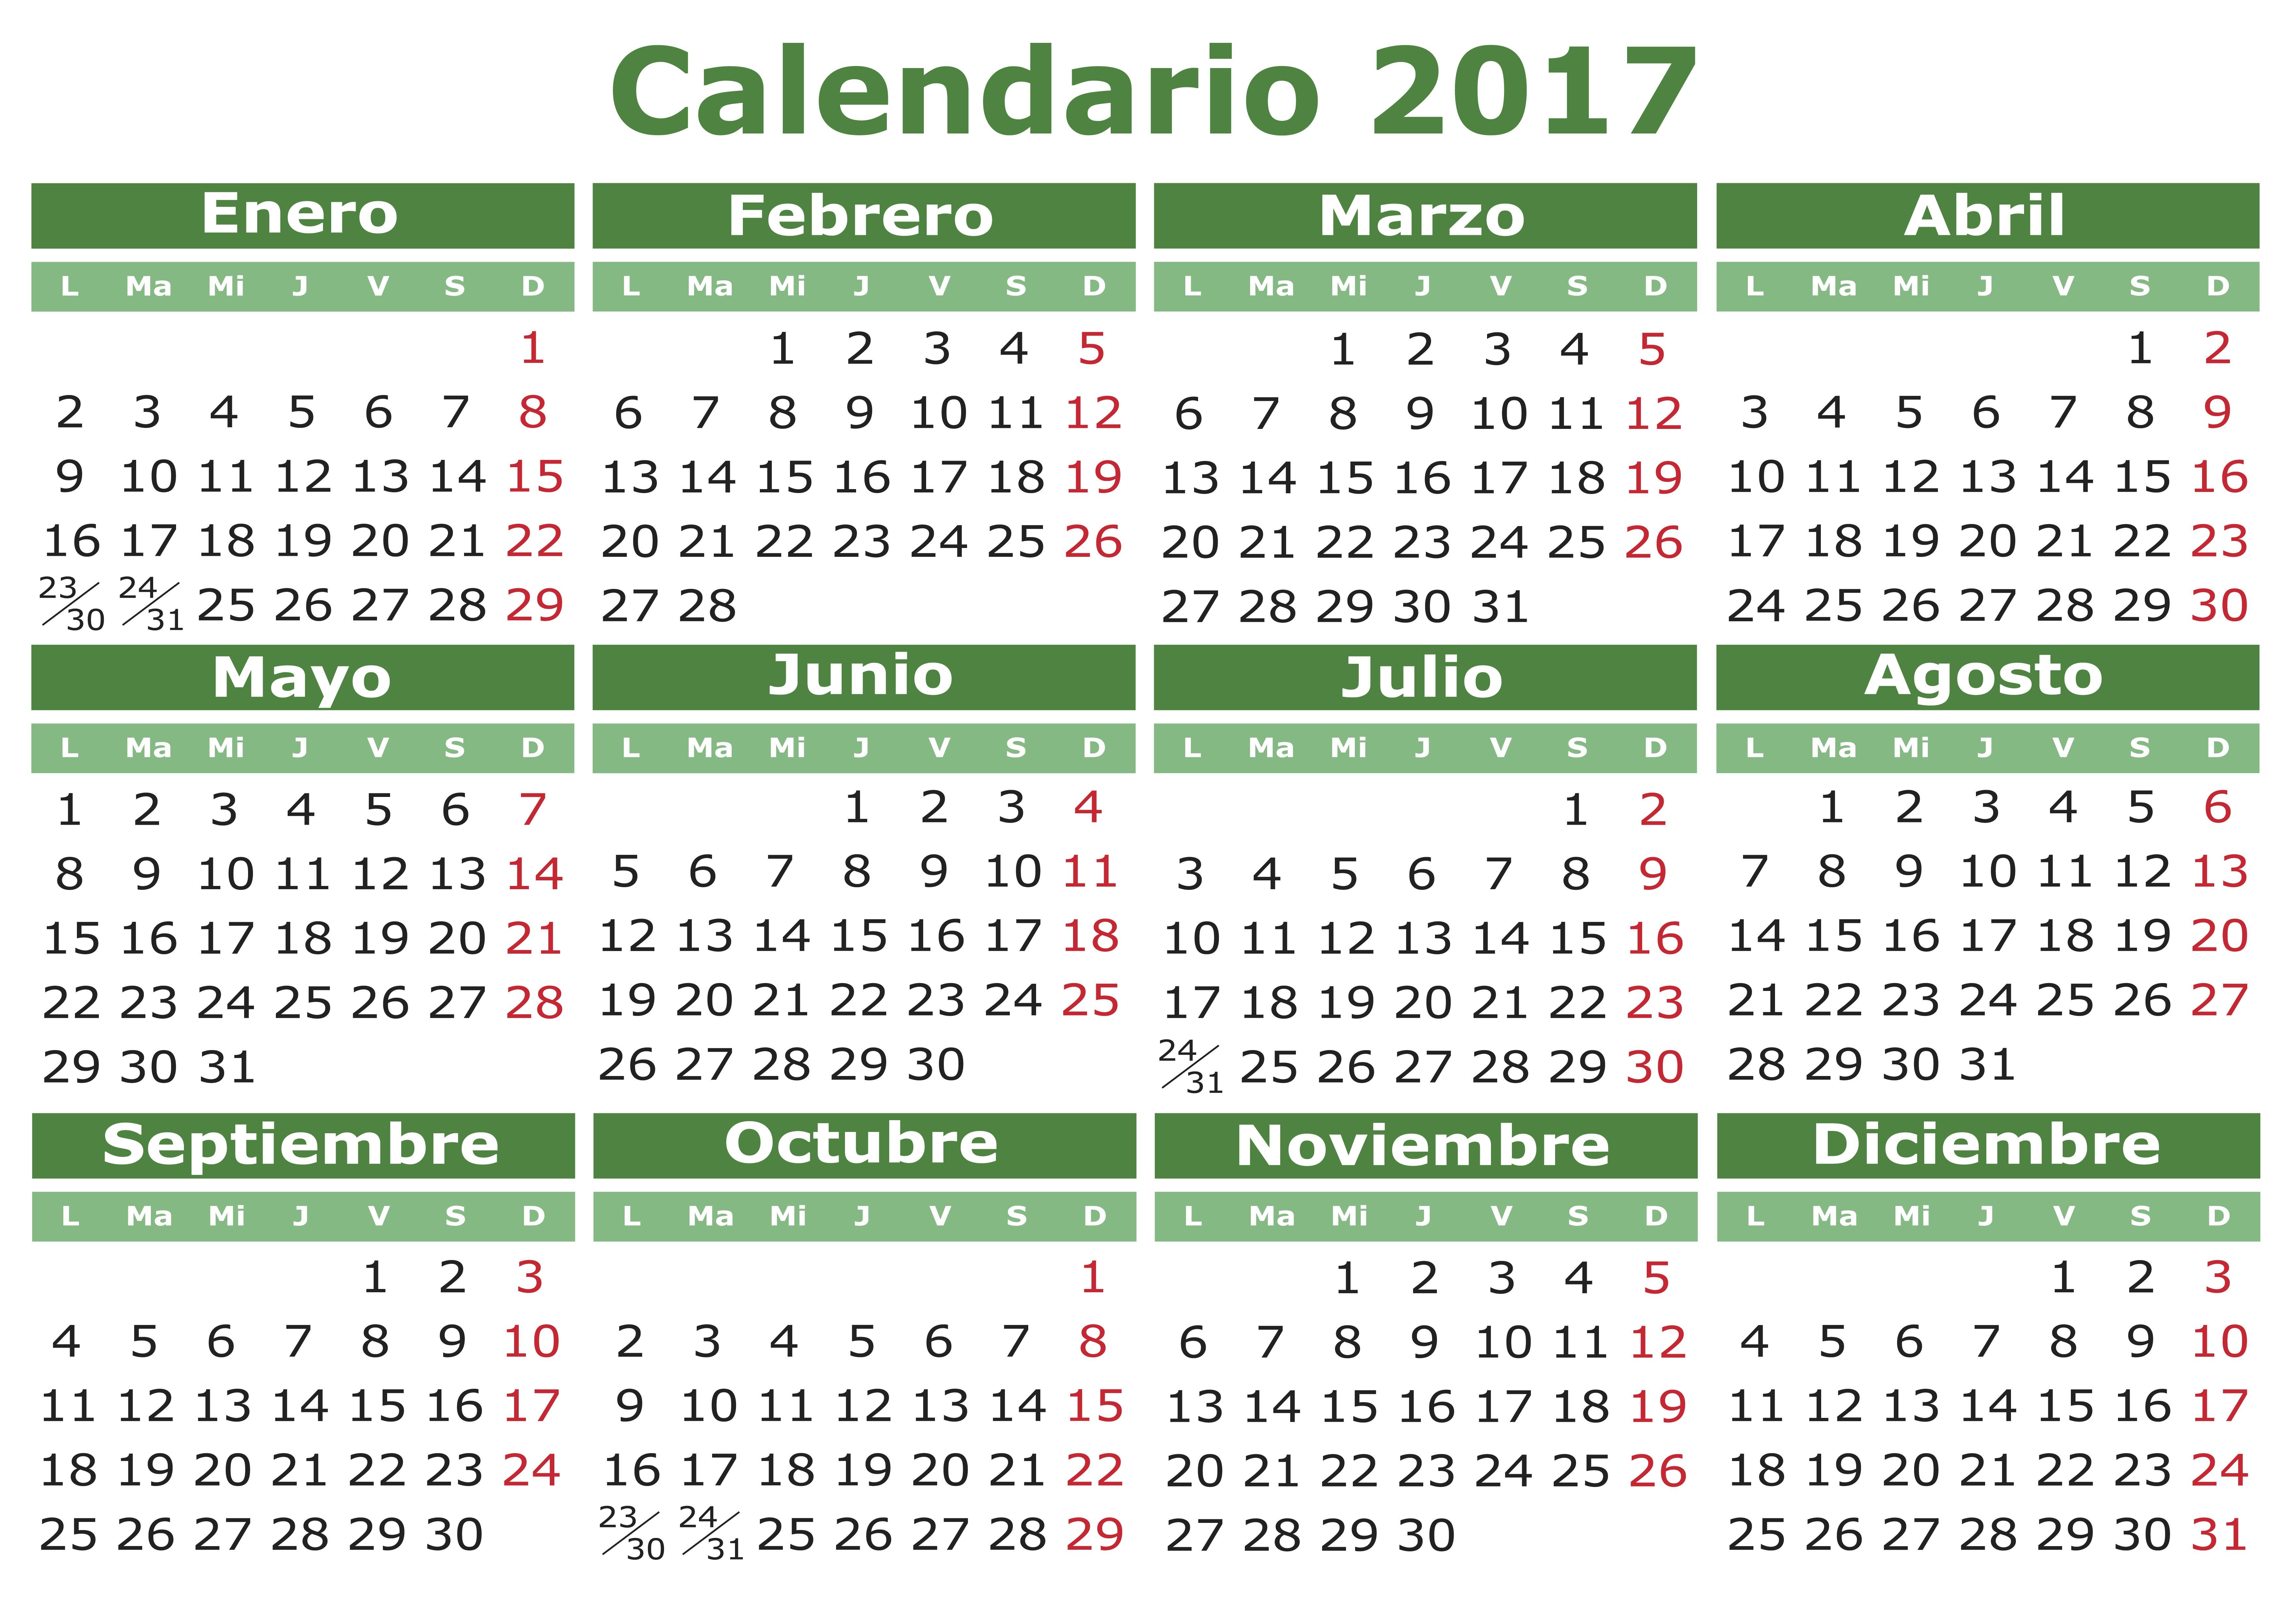 Spanish calendar 2017 orientaci n and jar recursos for Eventos madrid mayo 2017